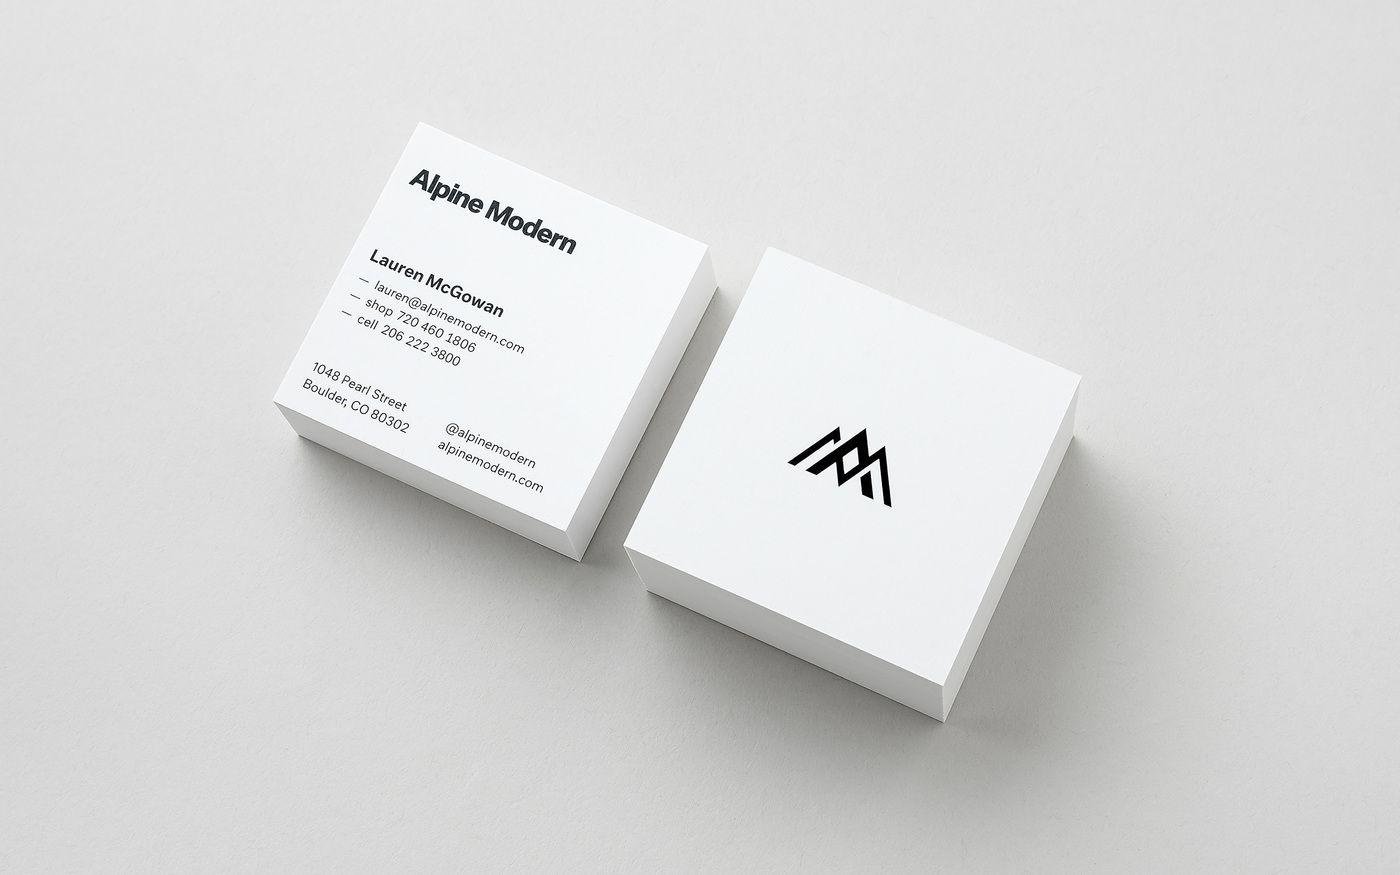 Cast Iron Design Alpine Modern Business Cards 1 Jpg Modern Branding Alpine Modern Branding Design Studio